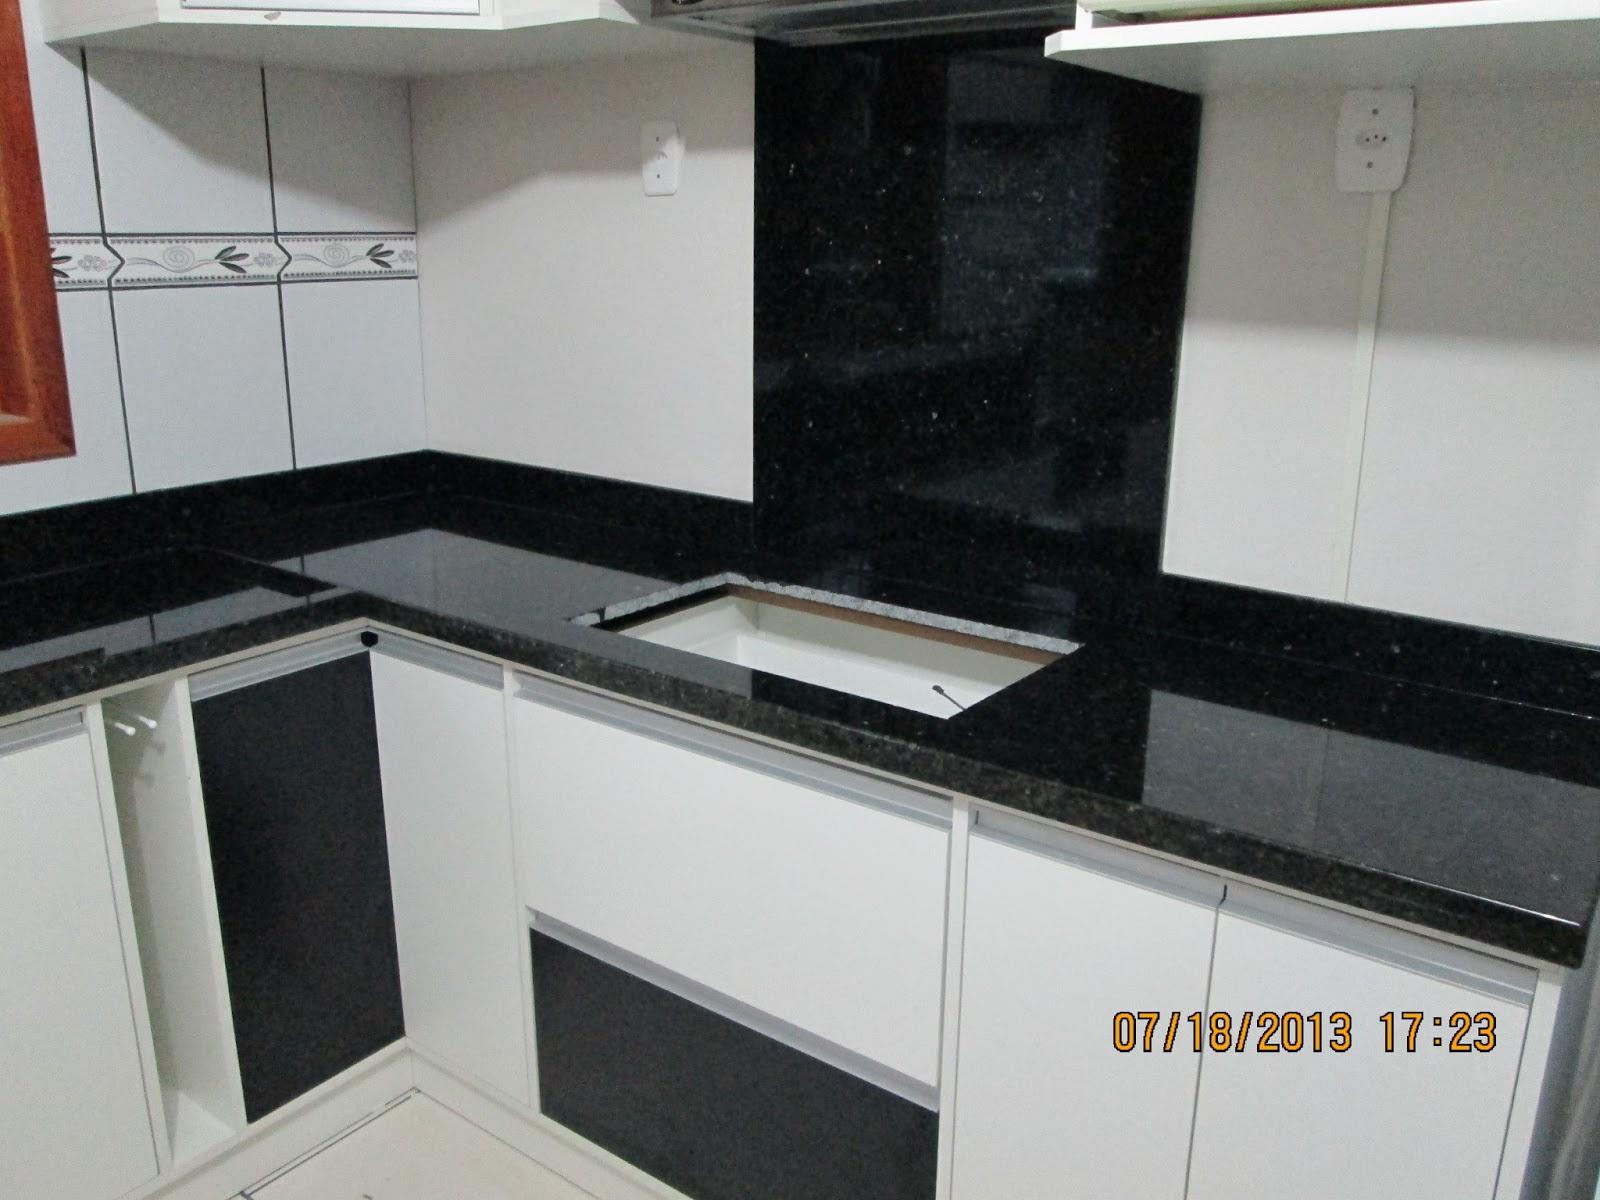 MARMORARIA CARDOZO: Cozinha de Granito Verde Ubatuba #75392A 1600 1200